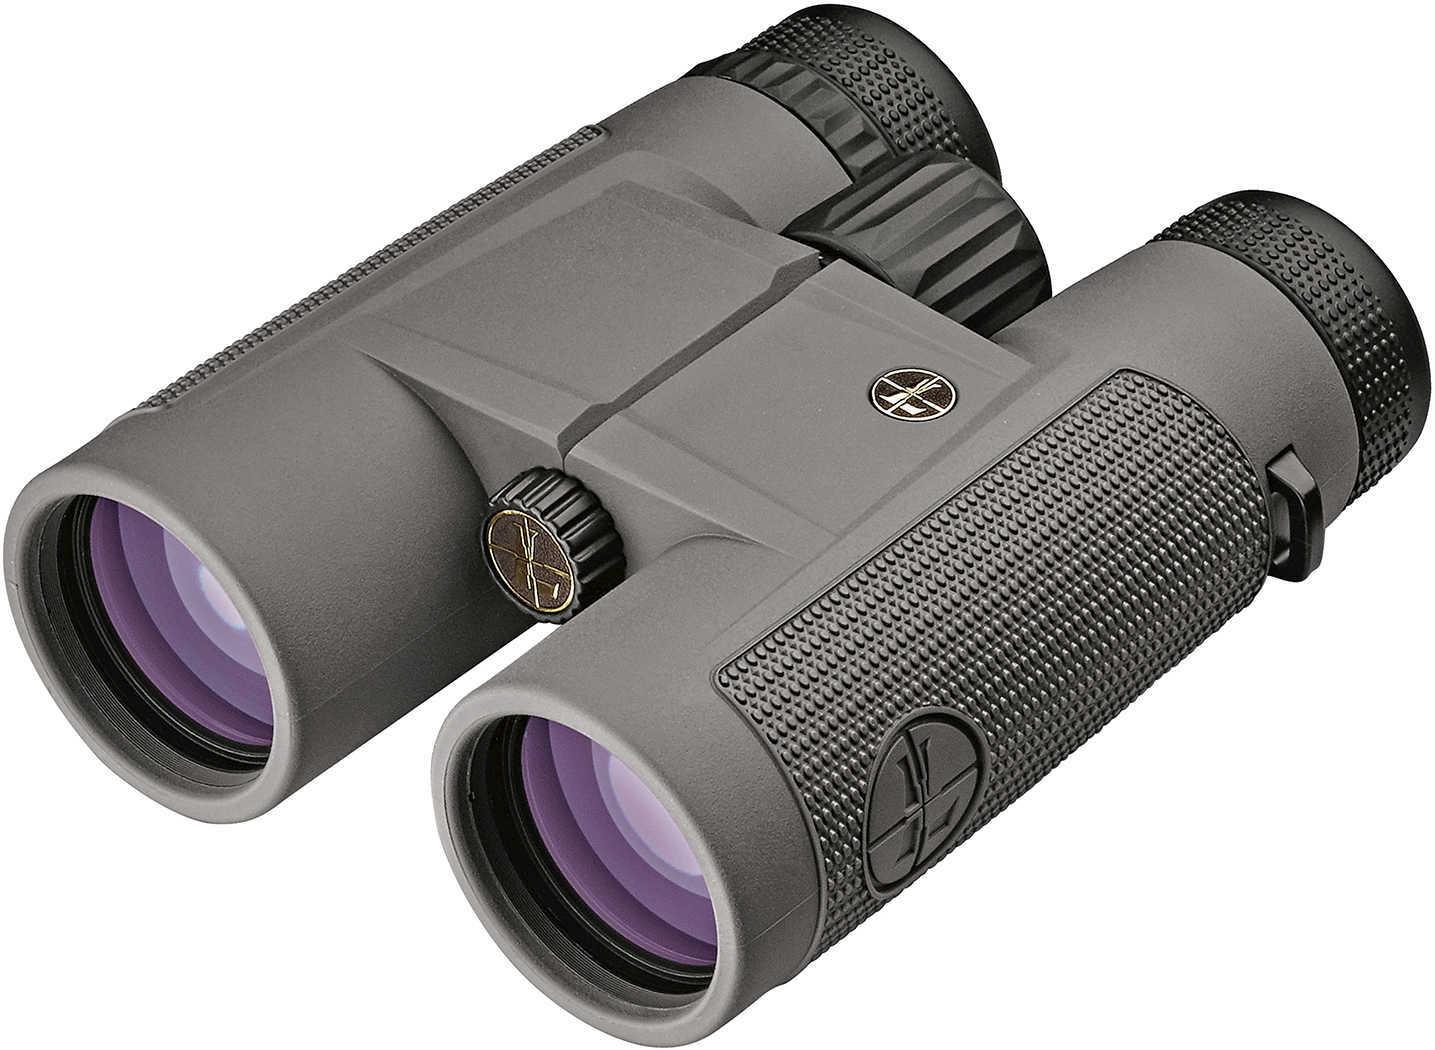 Leupold BX-1 McKenzie Binocular, 10x42mm, Roof Prism, Shadow Gray